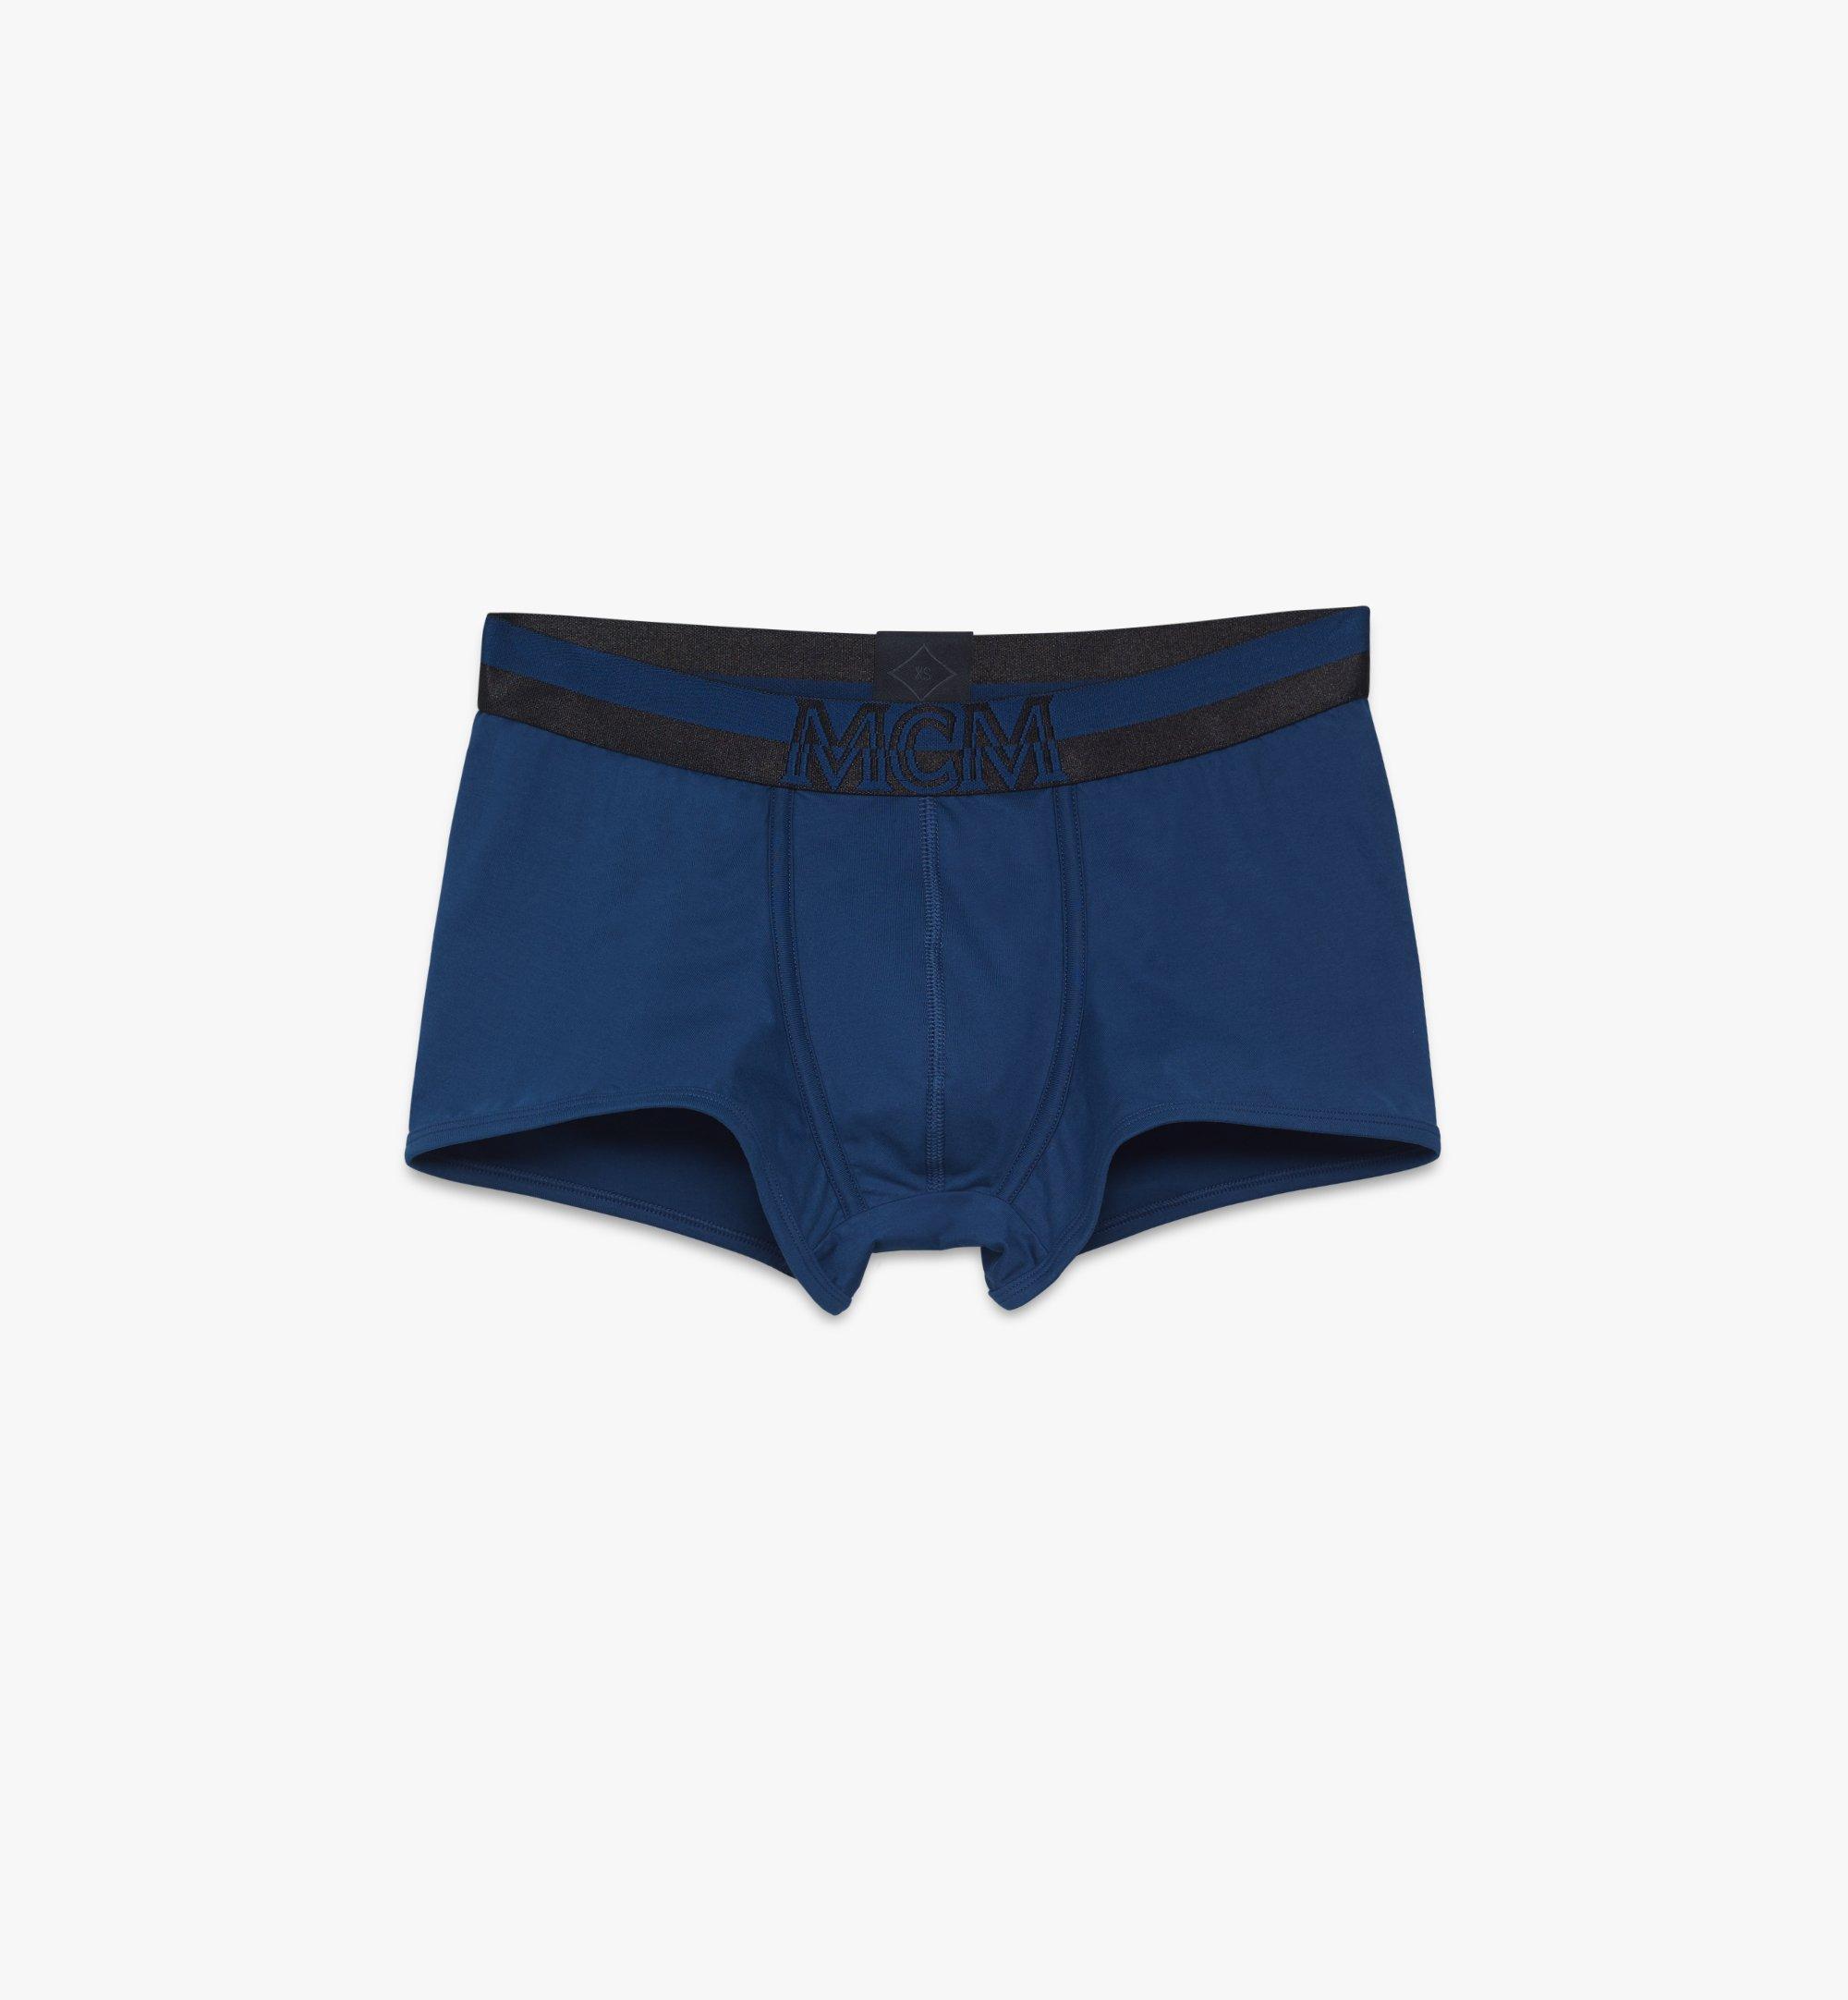 MCM 男士 1976 短款緊身四角褲 Blue MHYASBM02LU00M 更多視圖 1